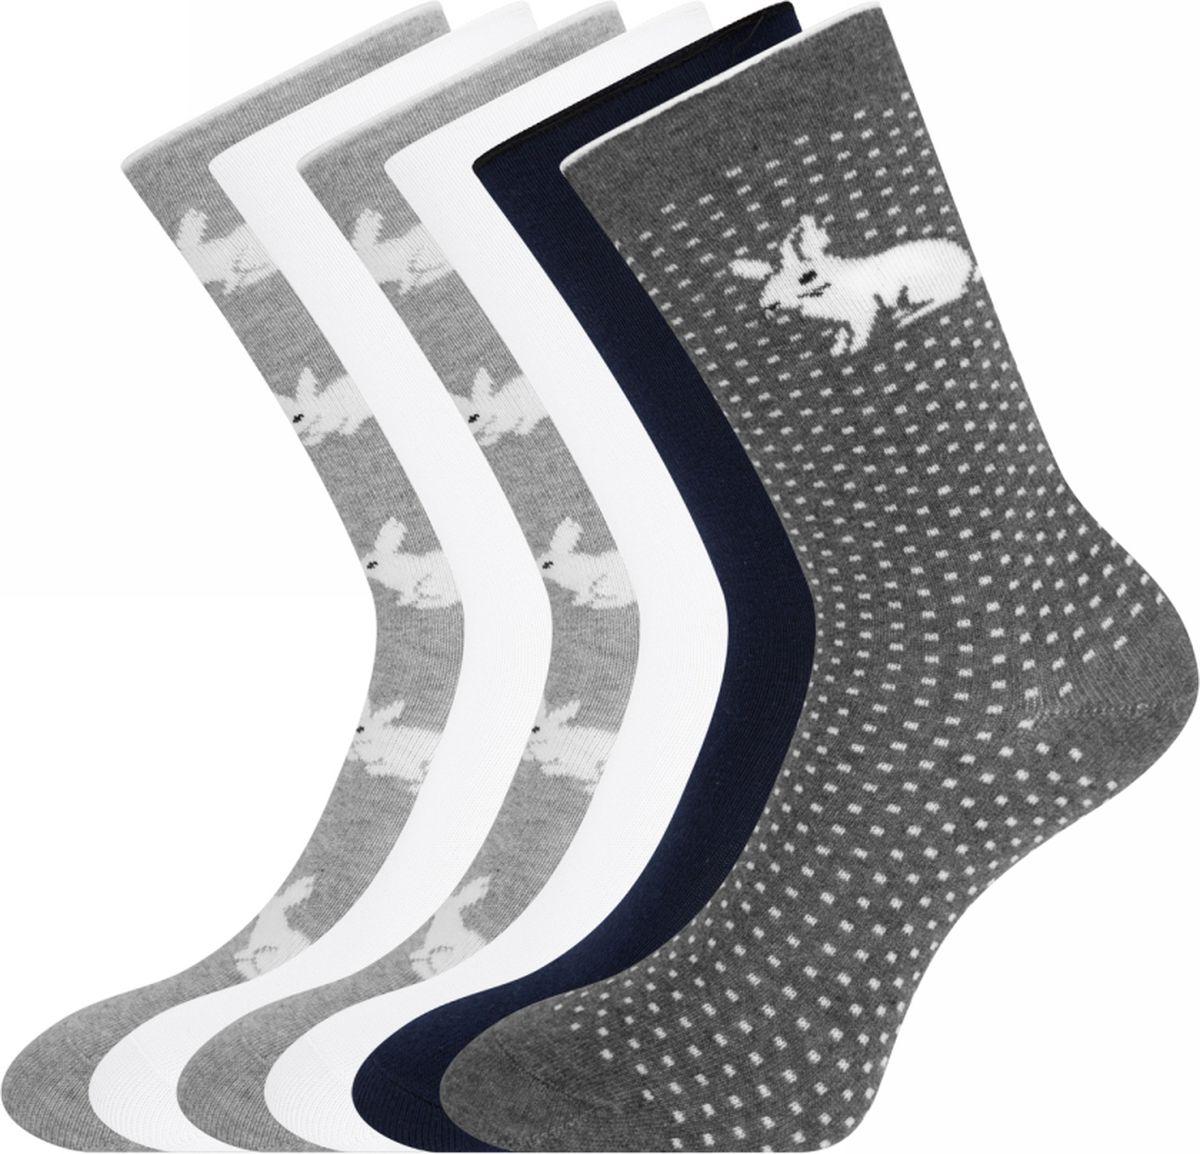 Носки oodji носки женские oodji цвет разноцветный 3 пары 57102602t3 48022 5 размер 35 37